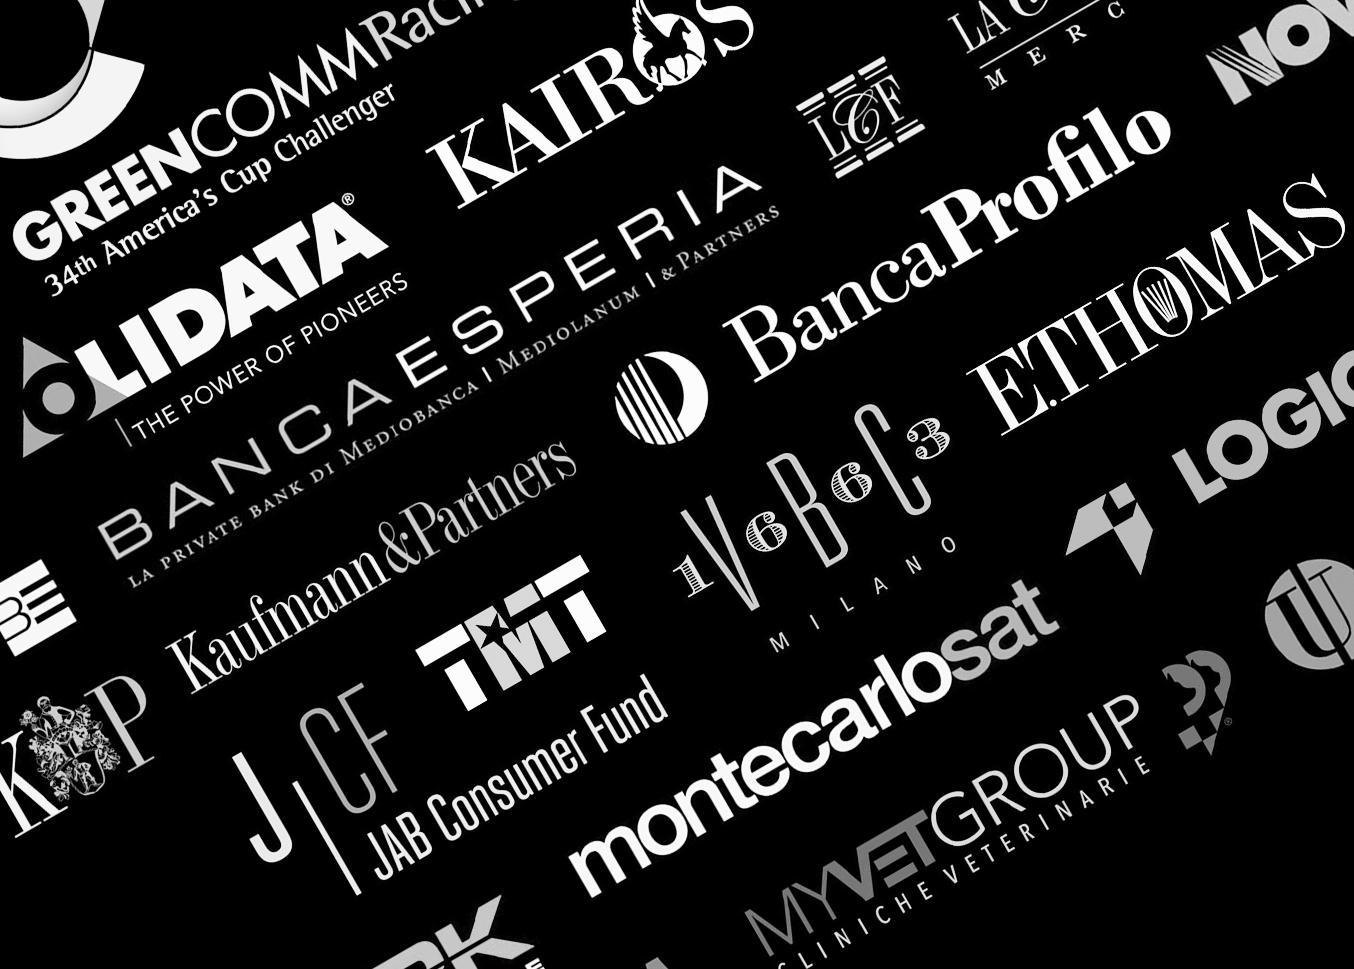 Trademarks & Logotypes